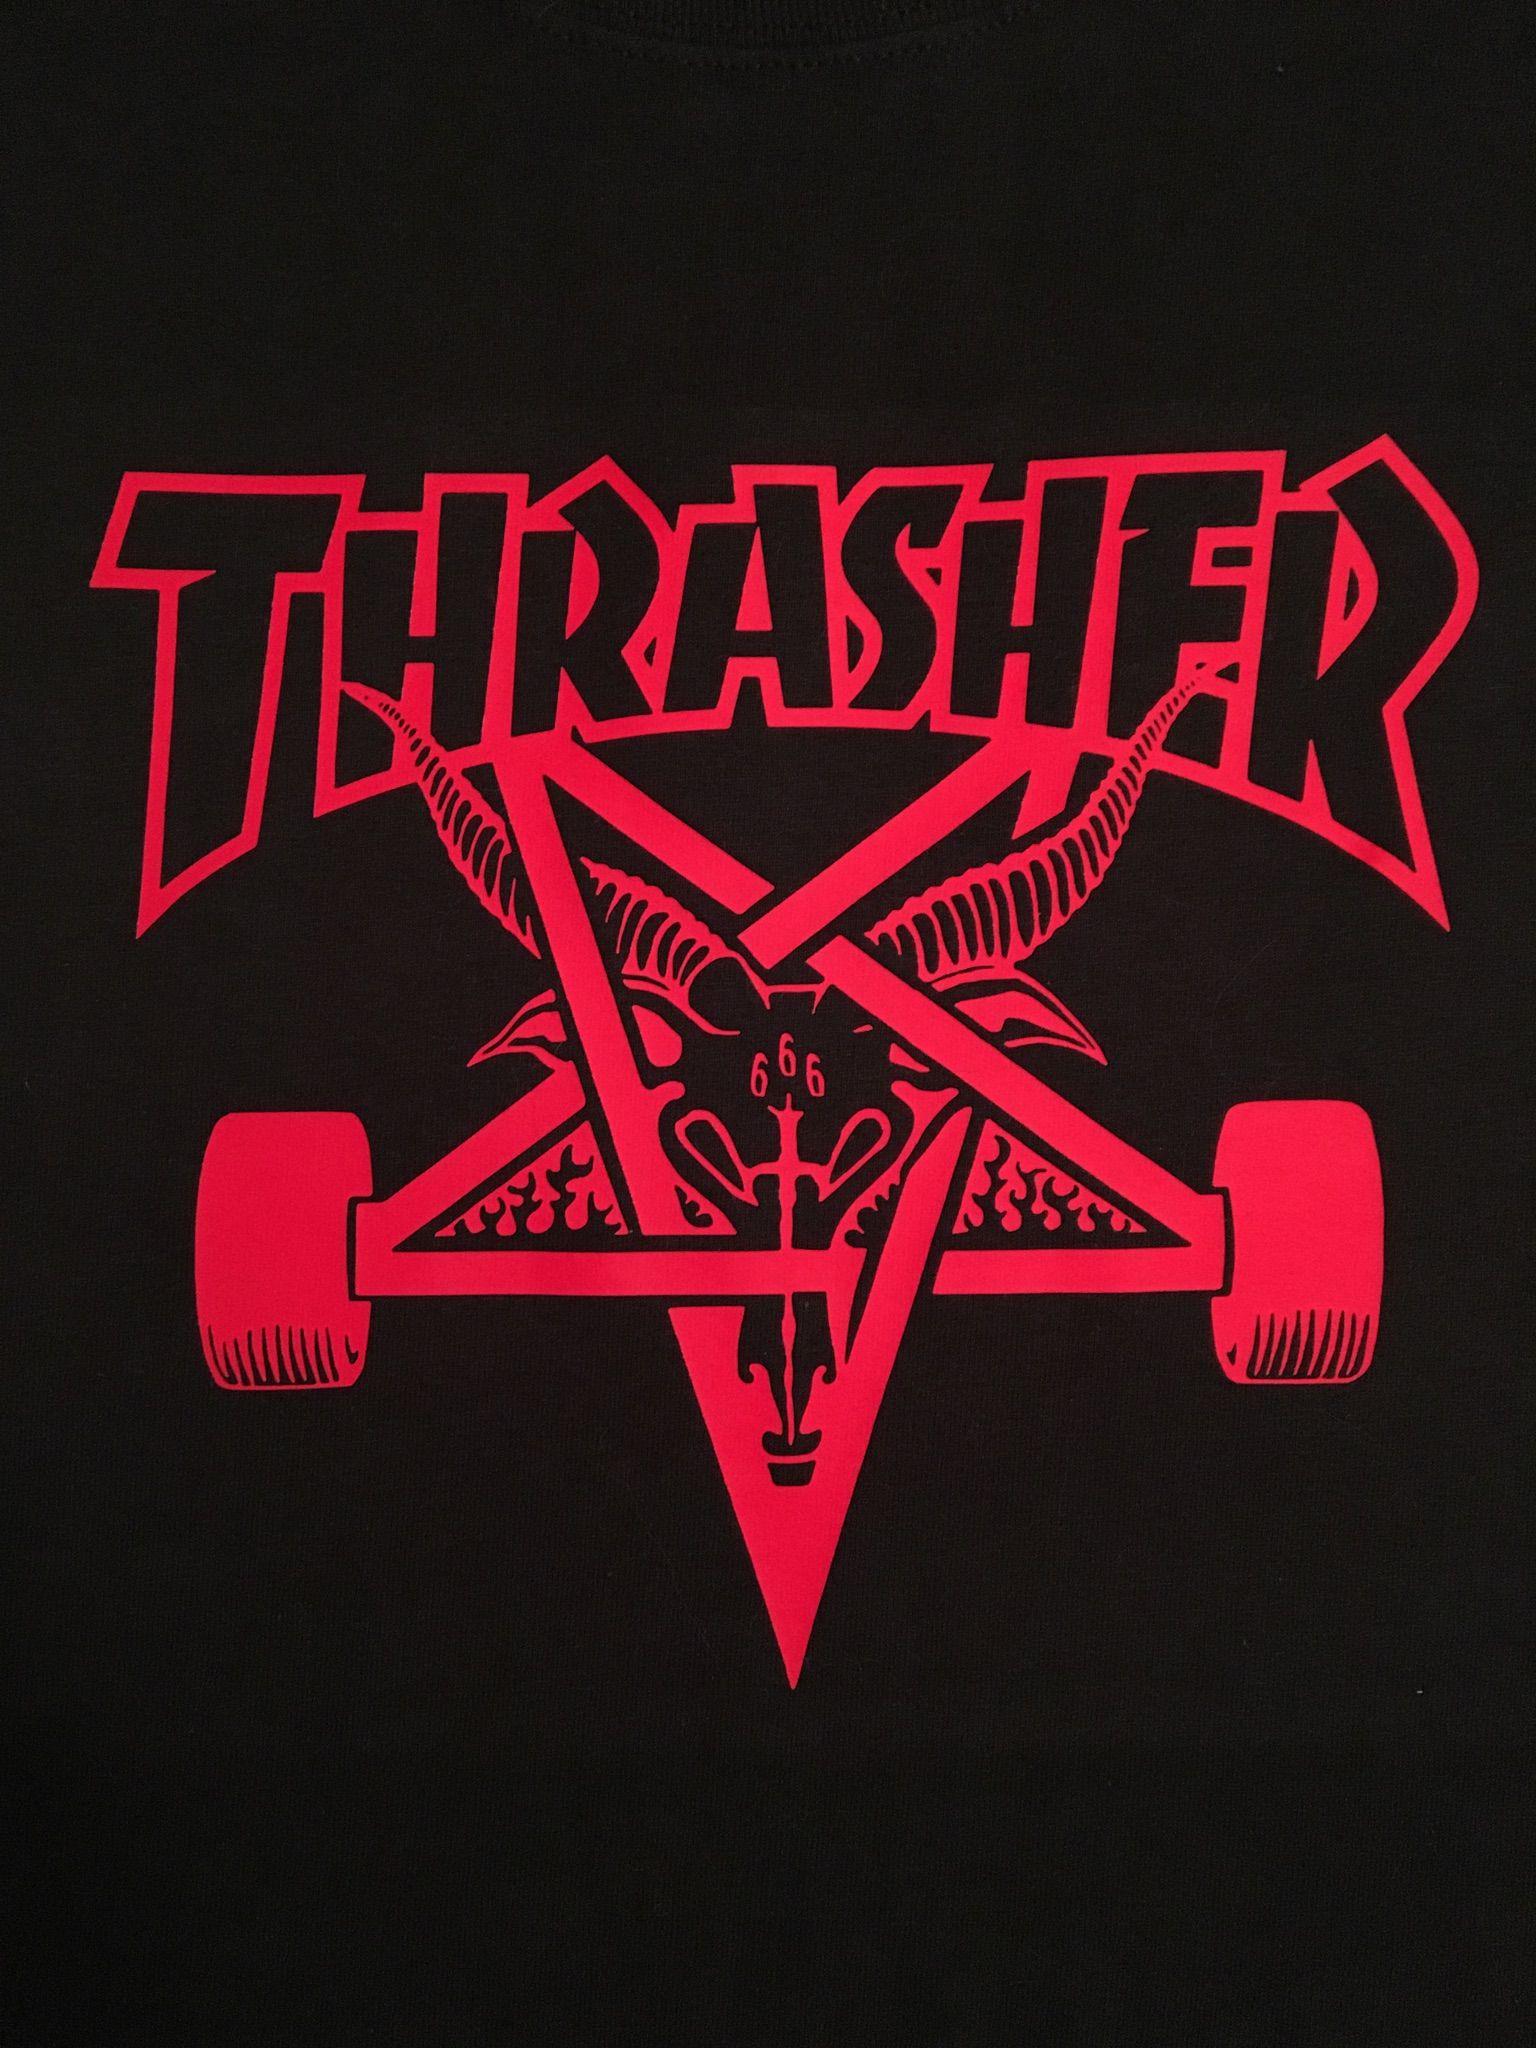 bd60c056 Thrasher Skateboard Magazine, Skate Goat | DIY shirts in 2019 ...